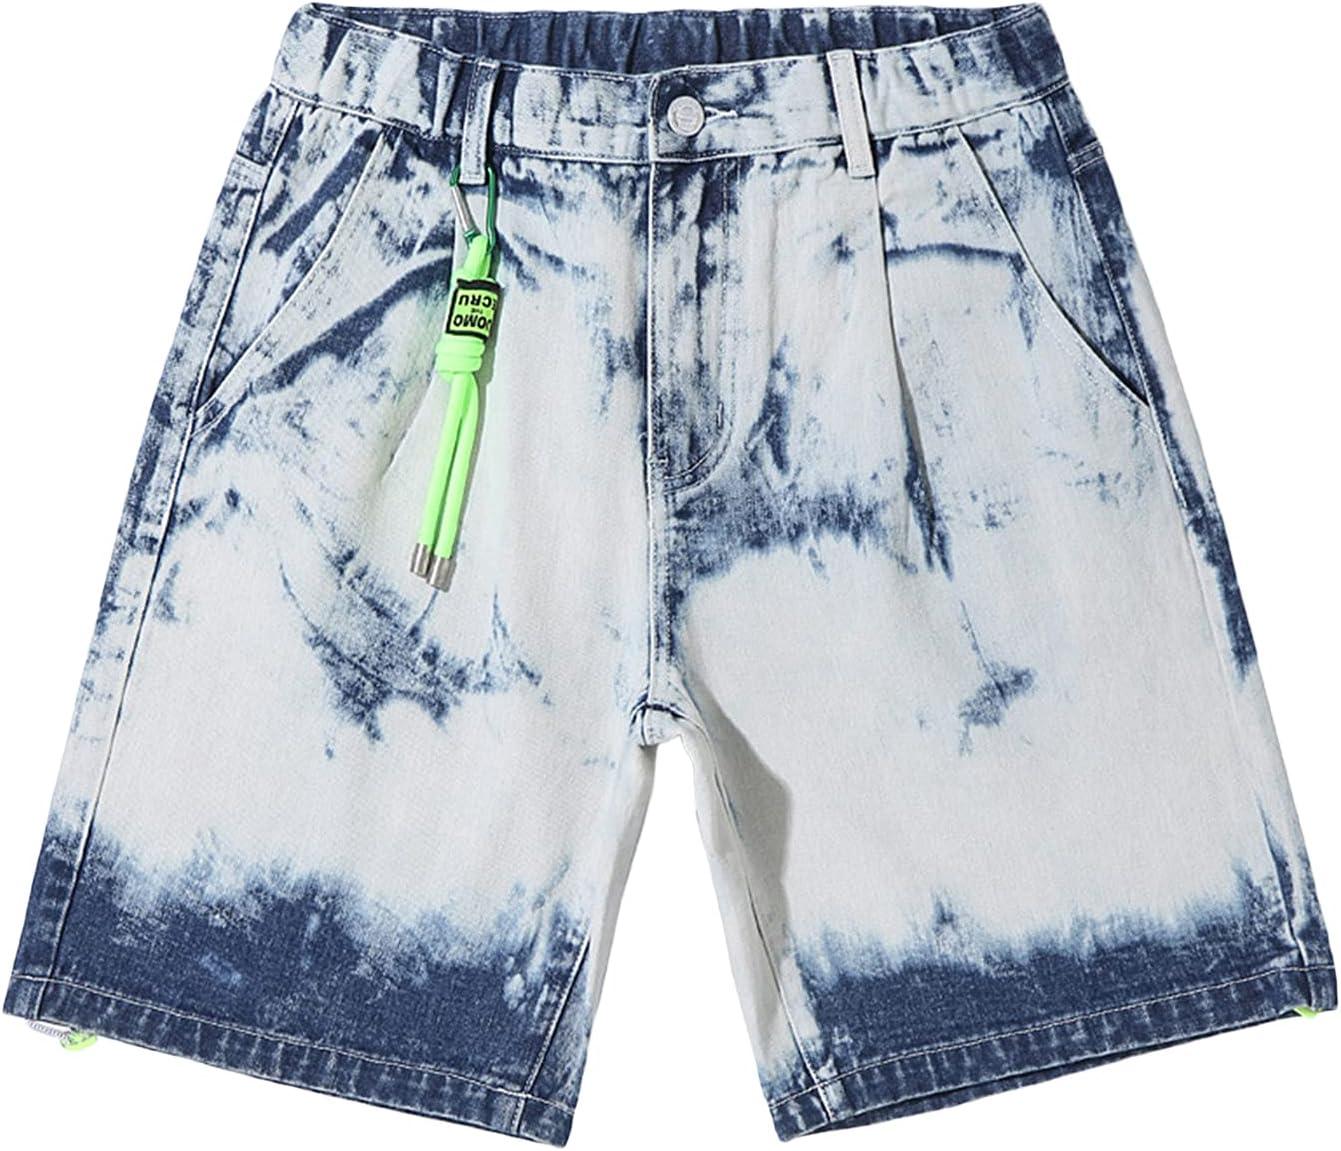 Men's Casual Fashion Tie-dye Denim Shorts Loose Large Size Comfortable Jean Short Retro Printed Summer Street Trend Shorts (White,XX-Large)